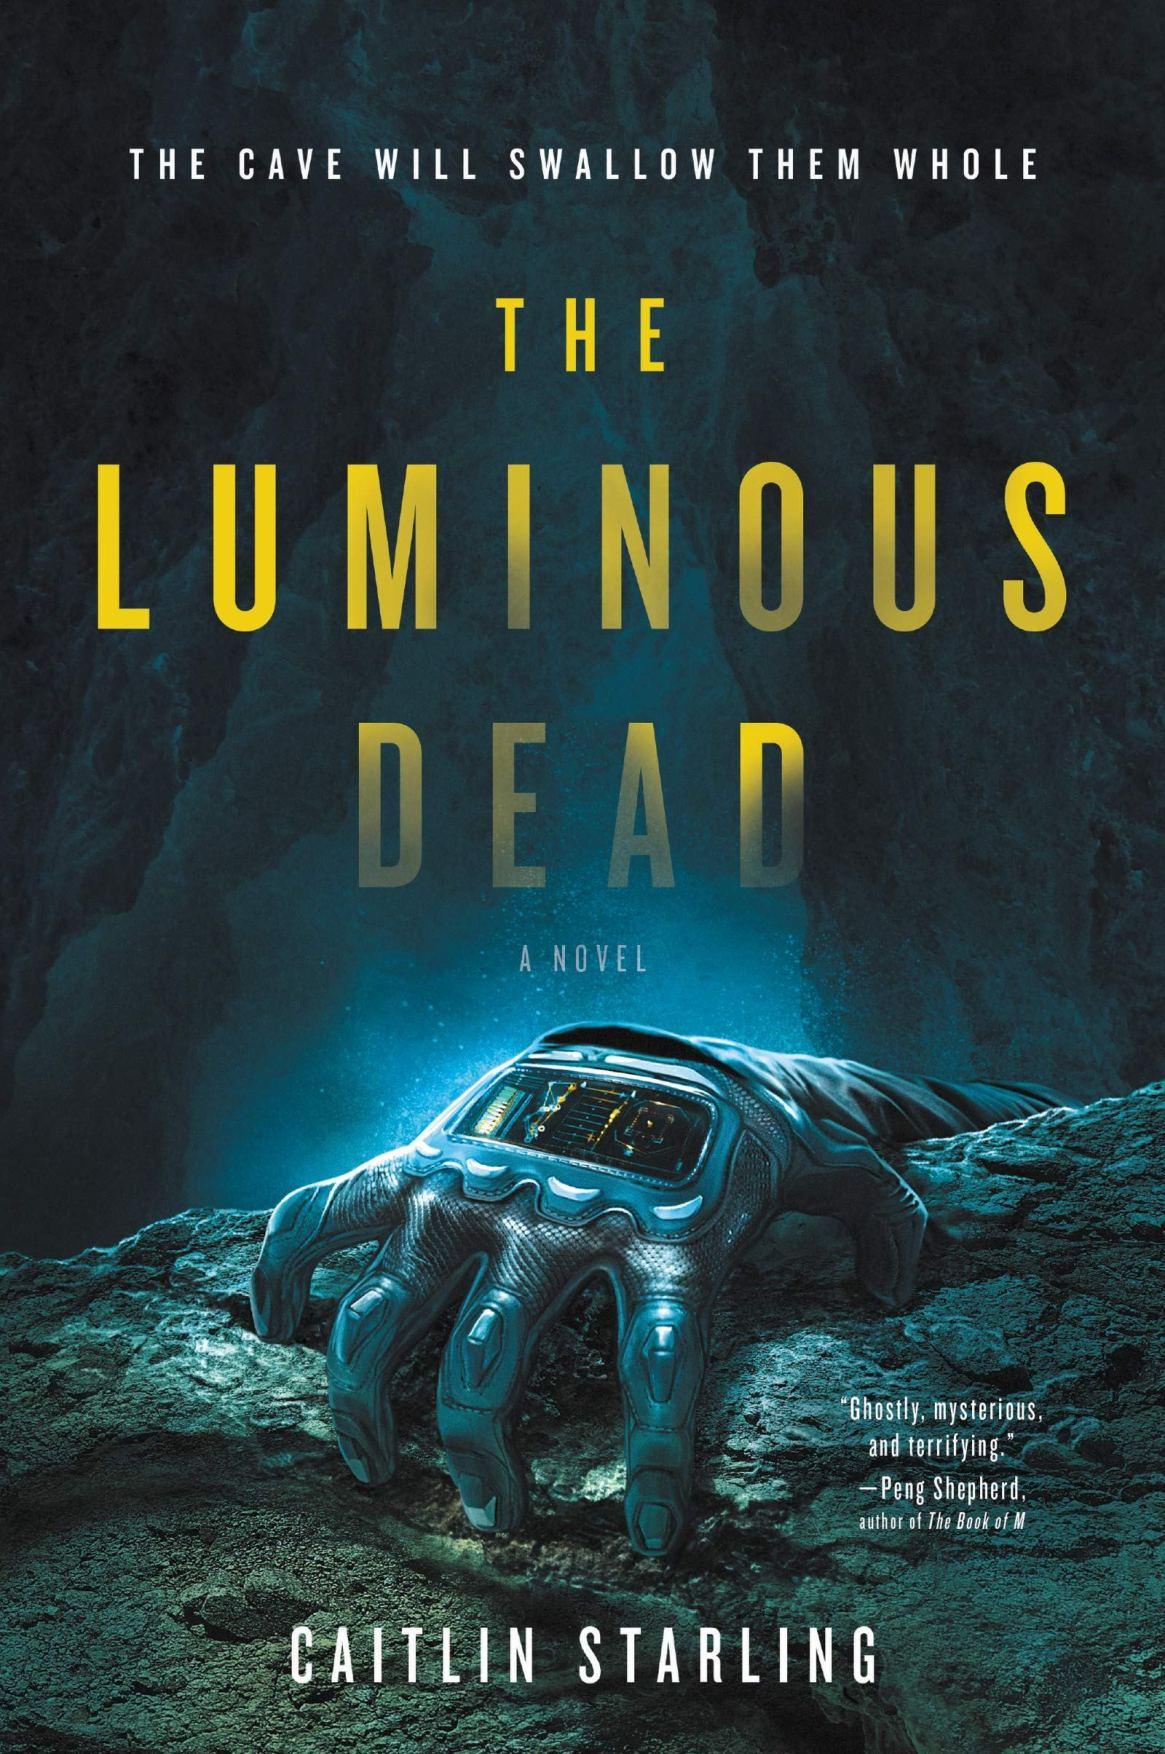 Caitlin Starling – The Luminous Dead Genre: